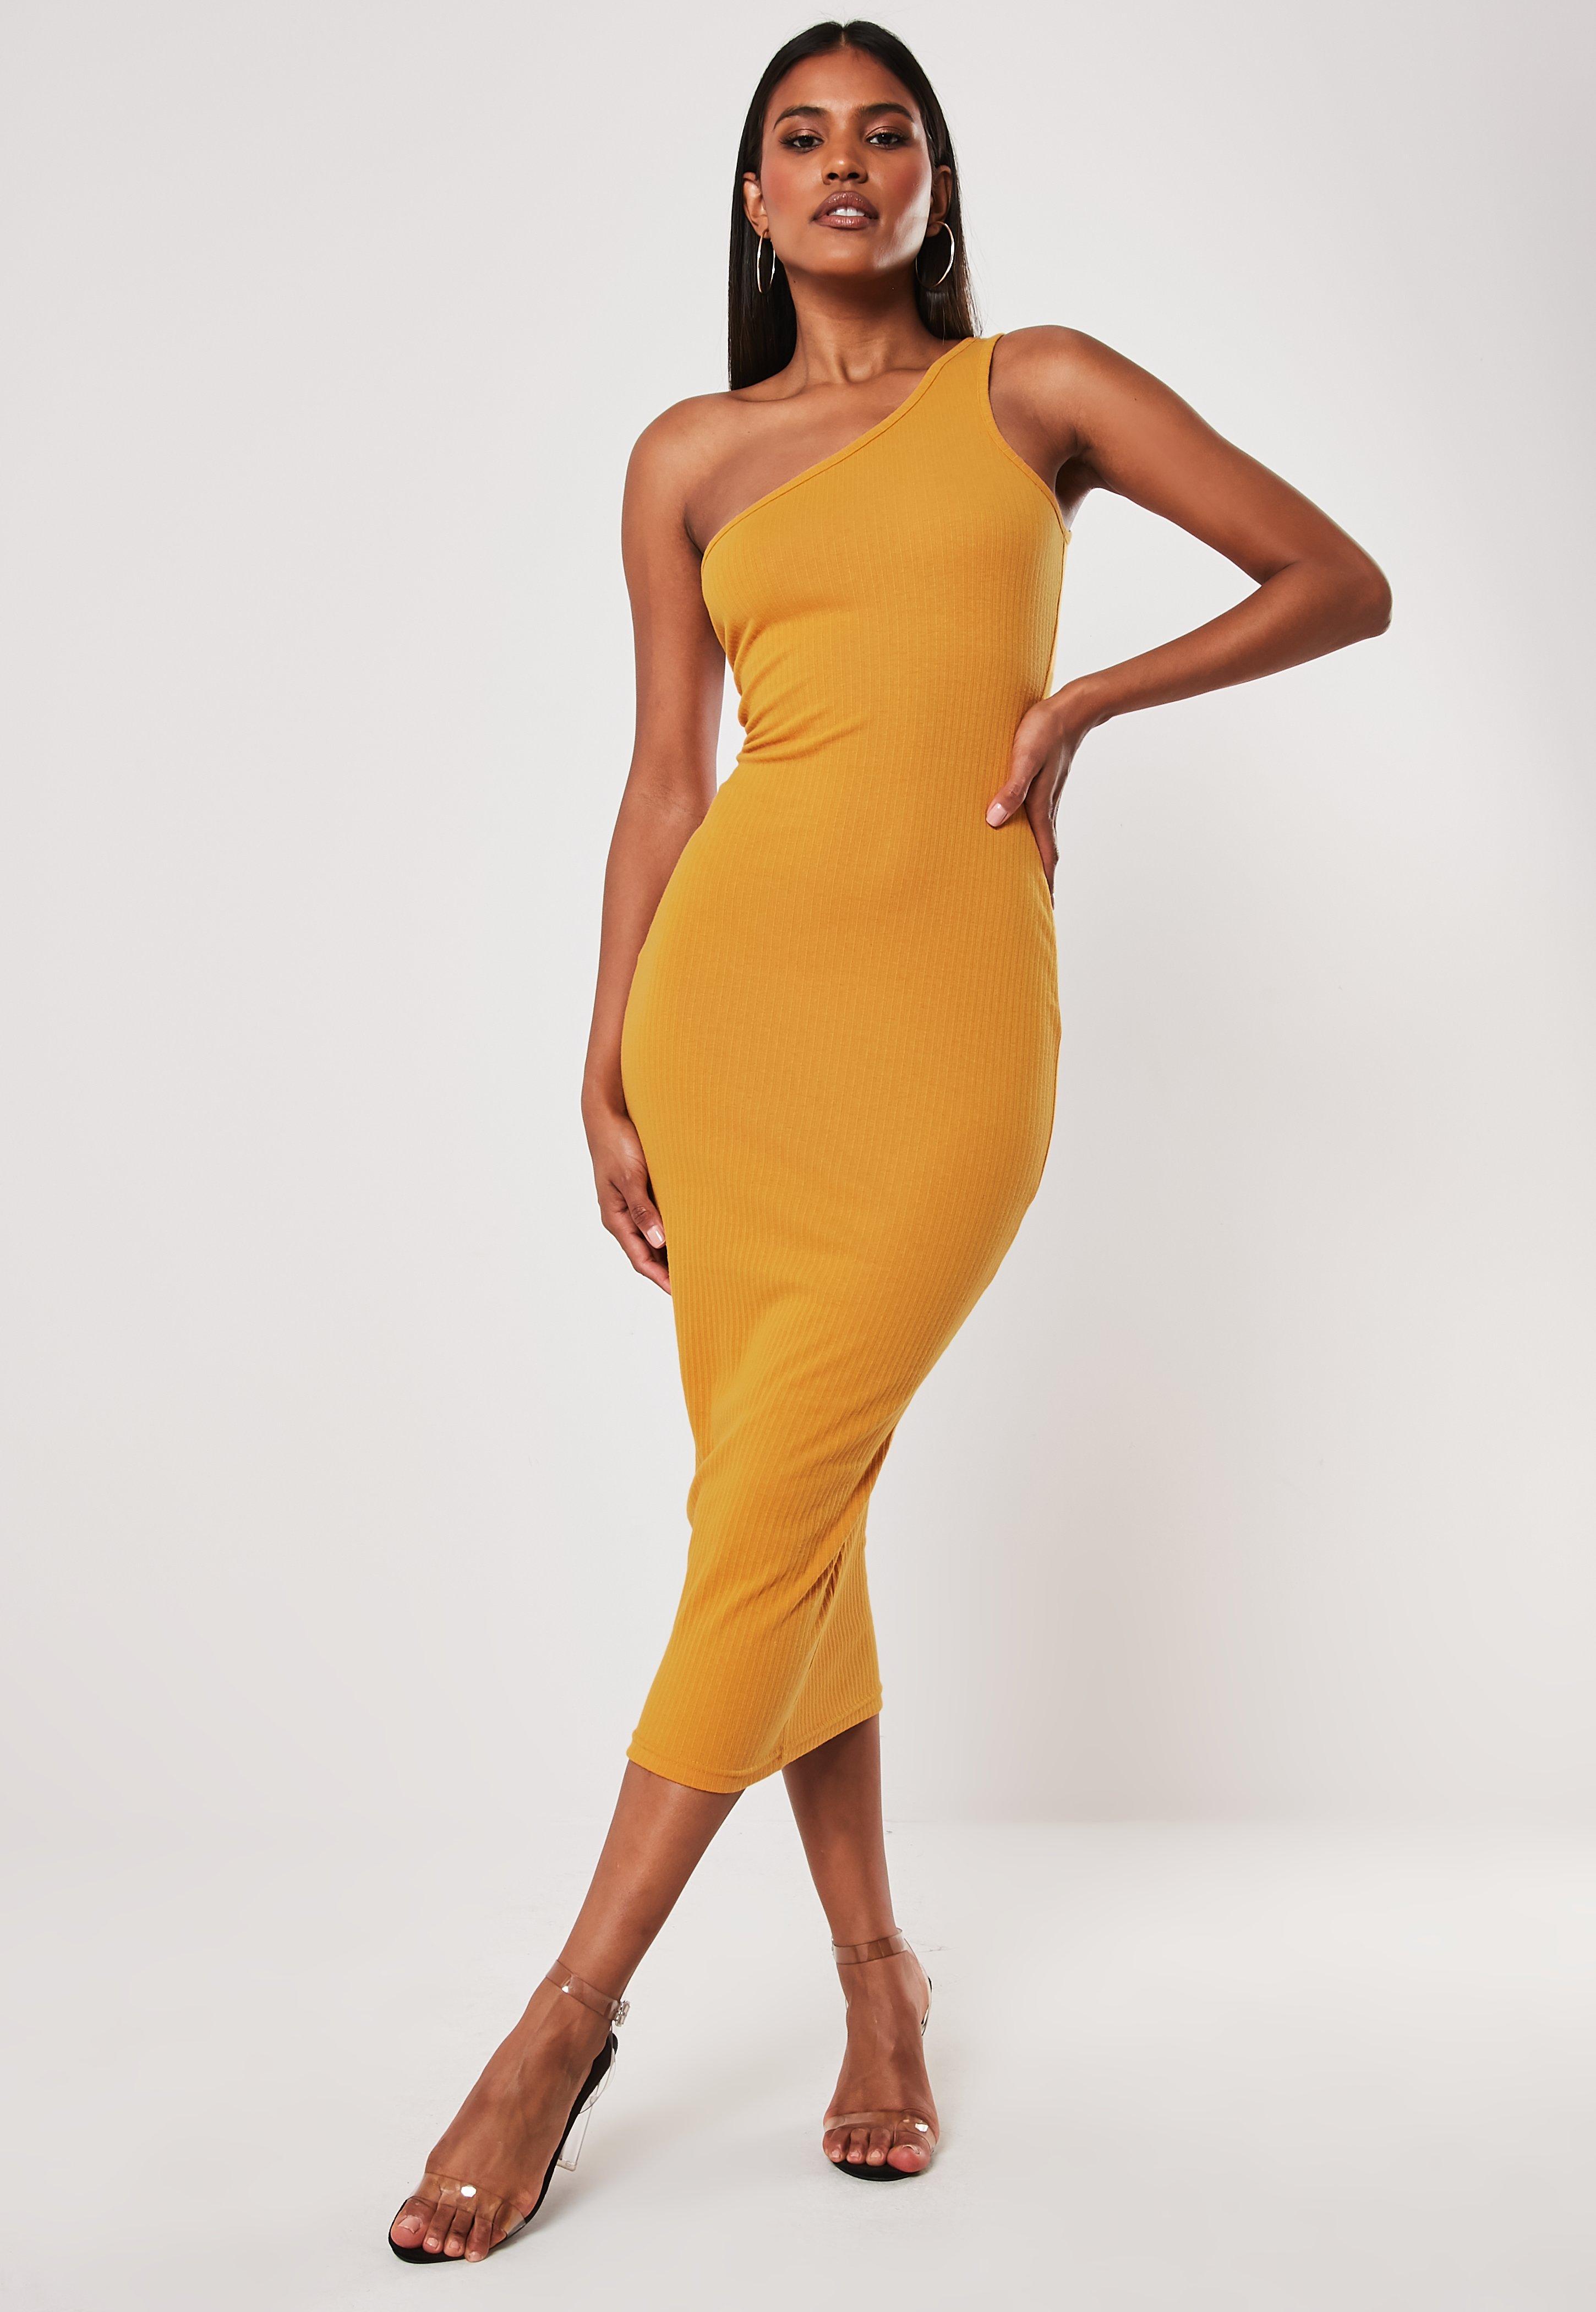 2eb2731afa958 One Shoulder Dresses | One Sleeve Dresses - Missguided